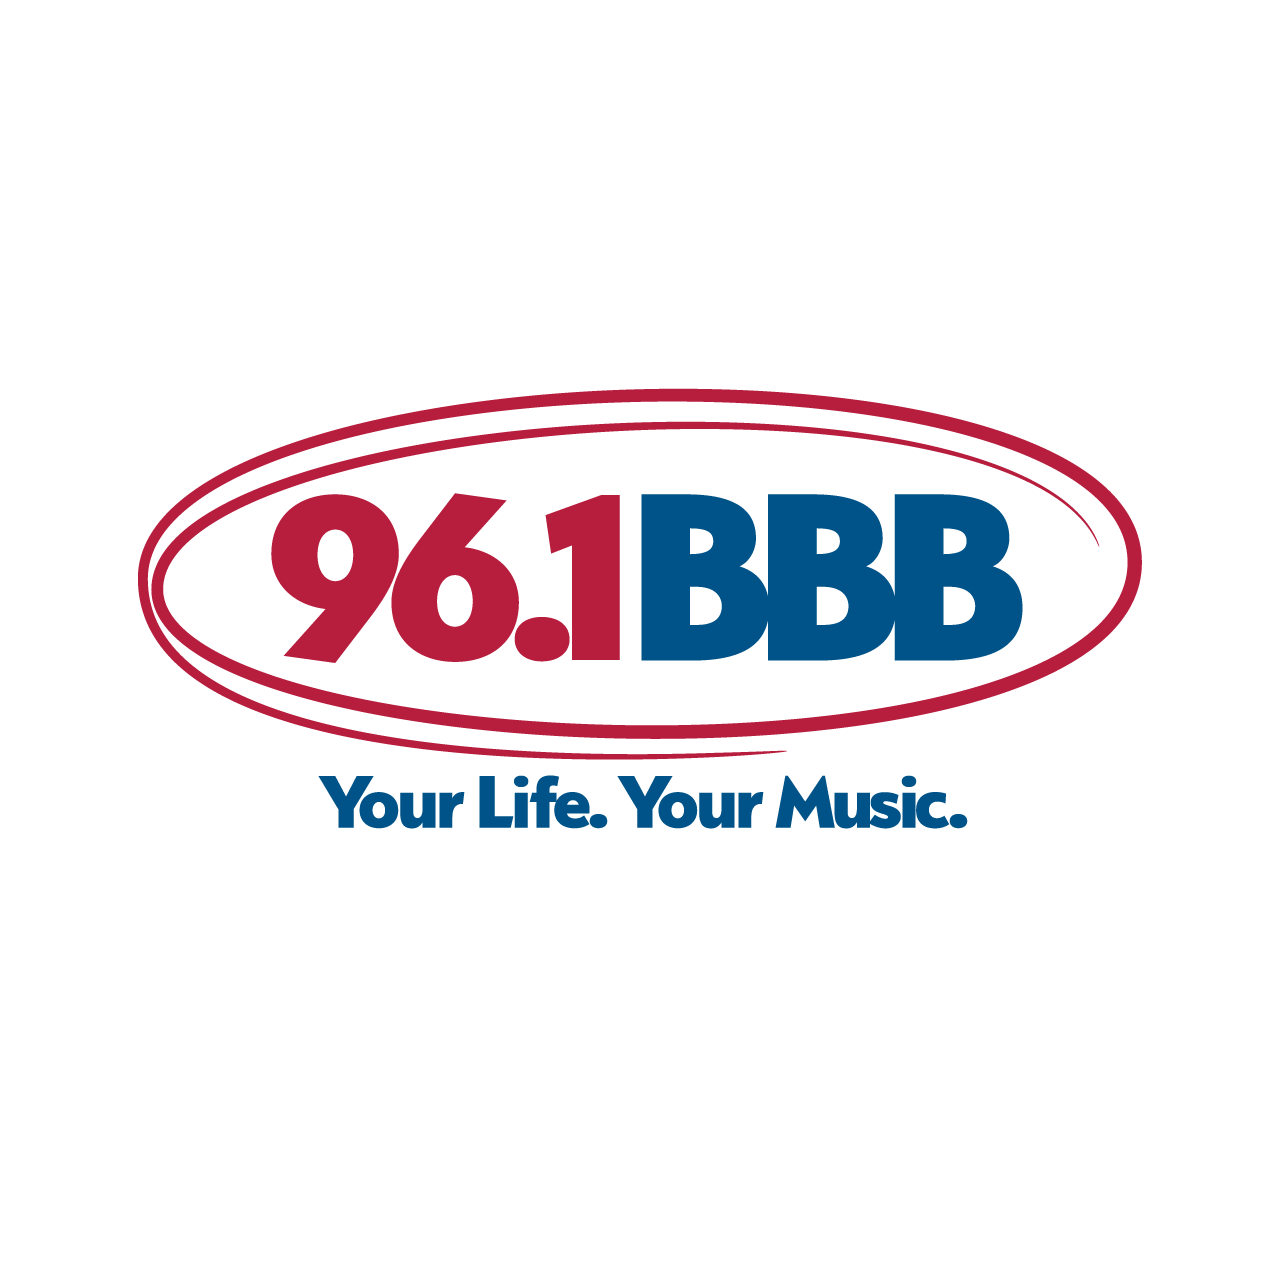 WBBB Radio 96.1 FM